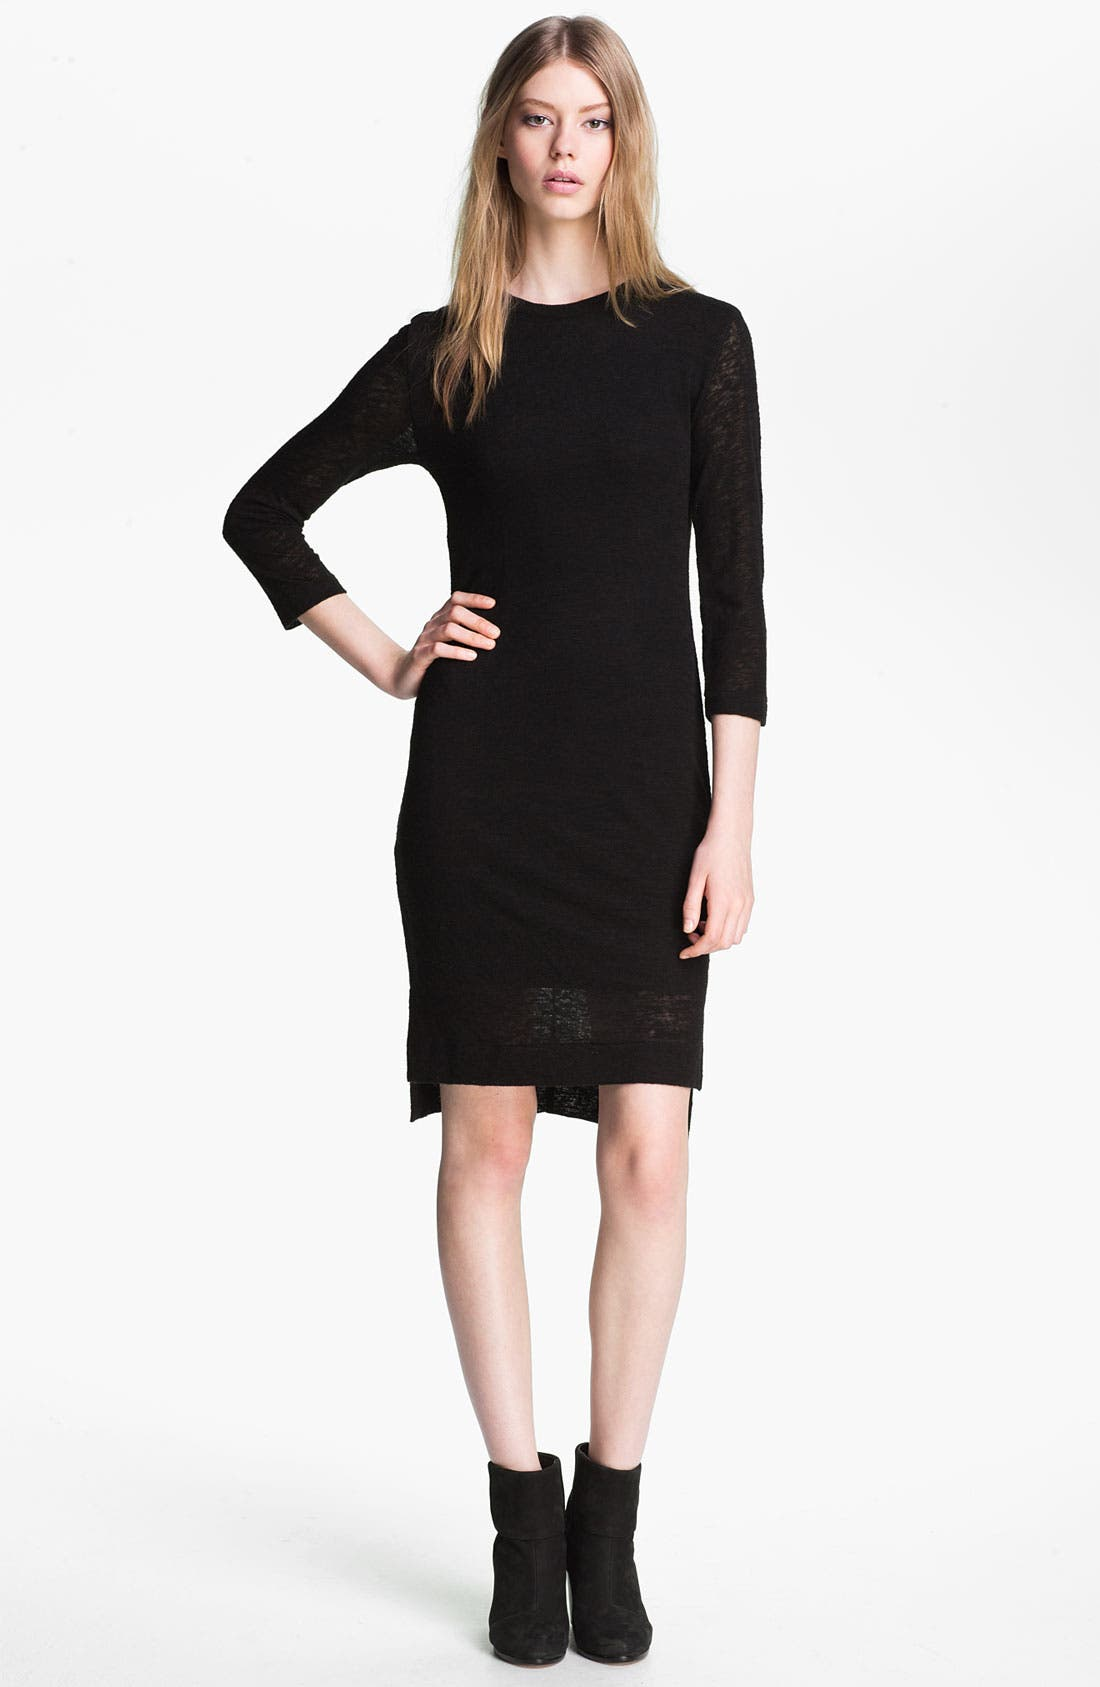 Alternate Image 1 Selected - rag & bone 'Karlie' Dress